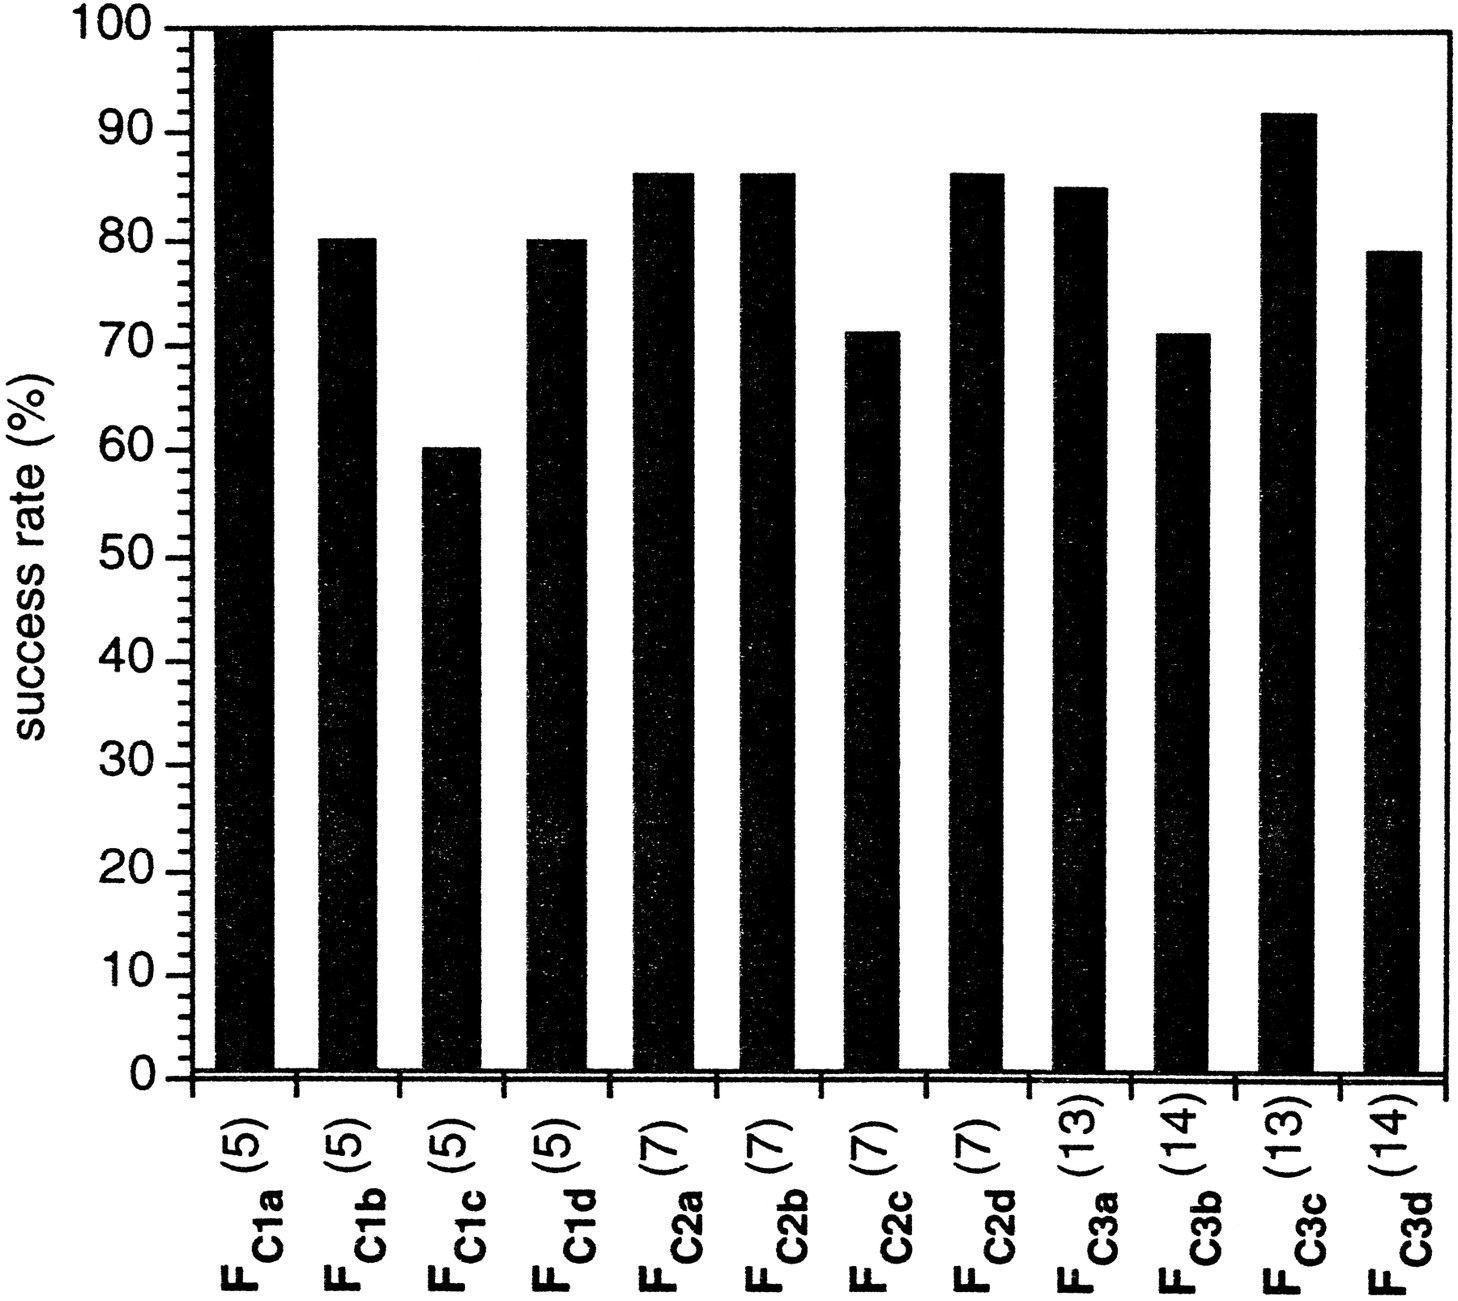 Aromasin bodybuilding dosierung ciprofloxacin